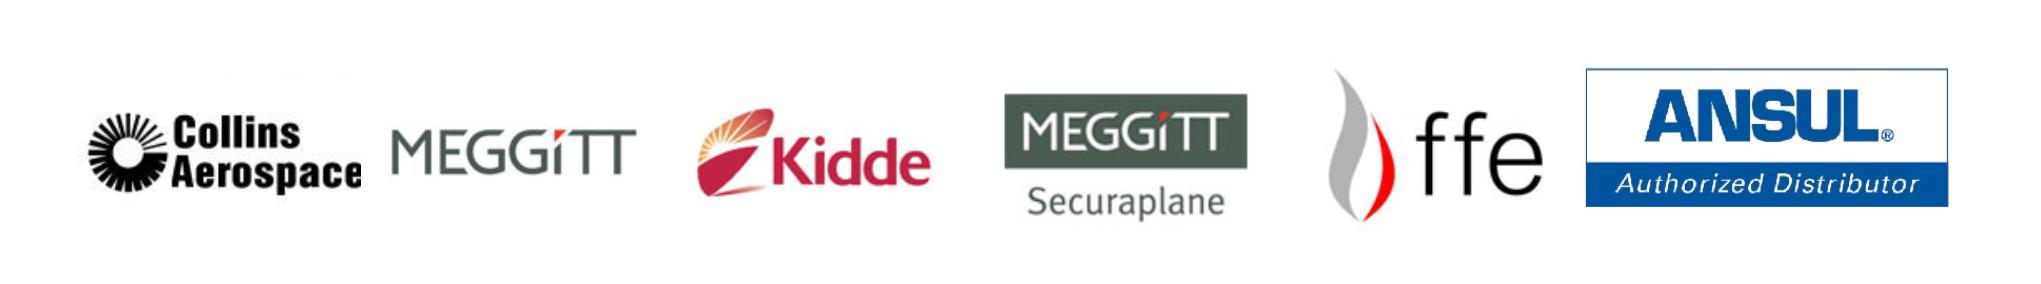 capabilities companies logos